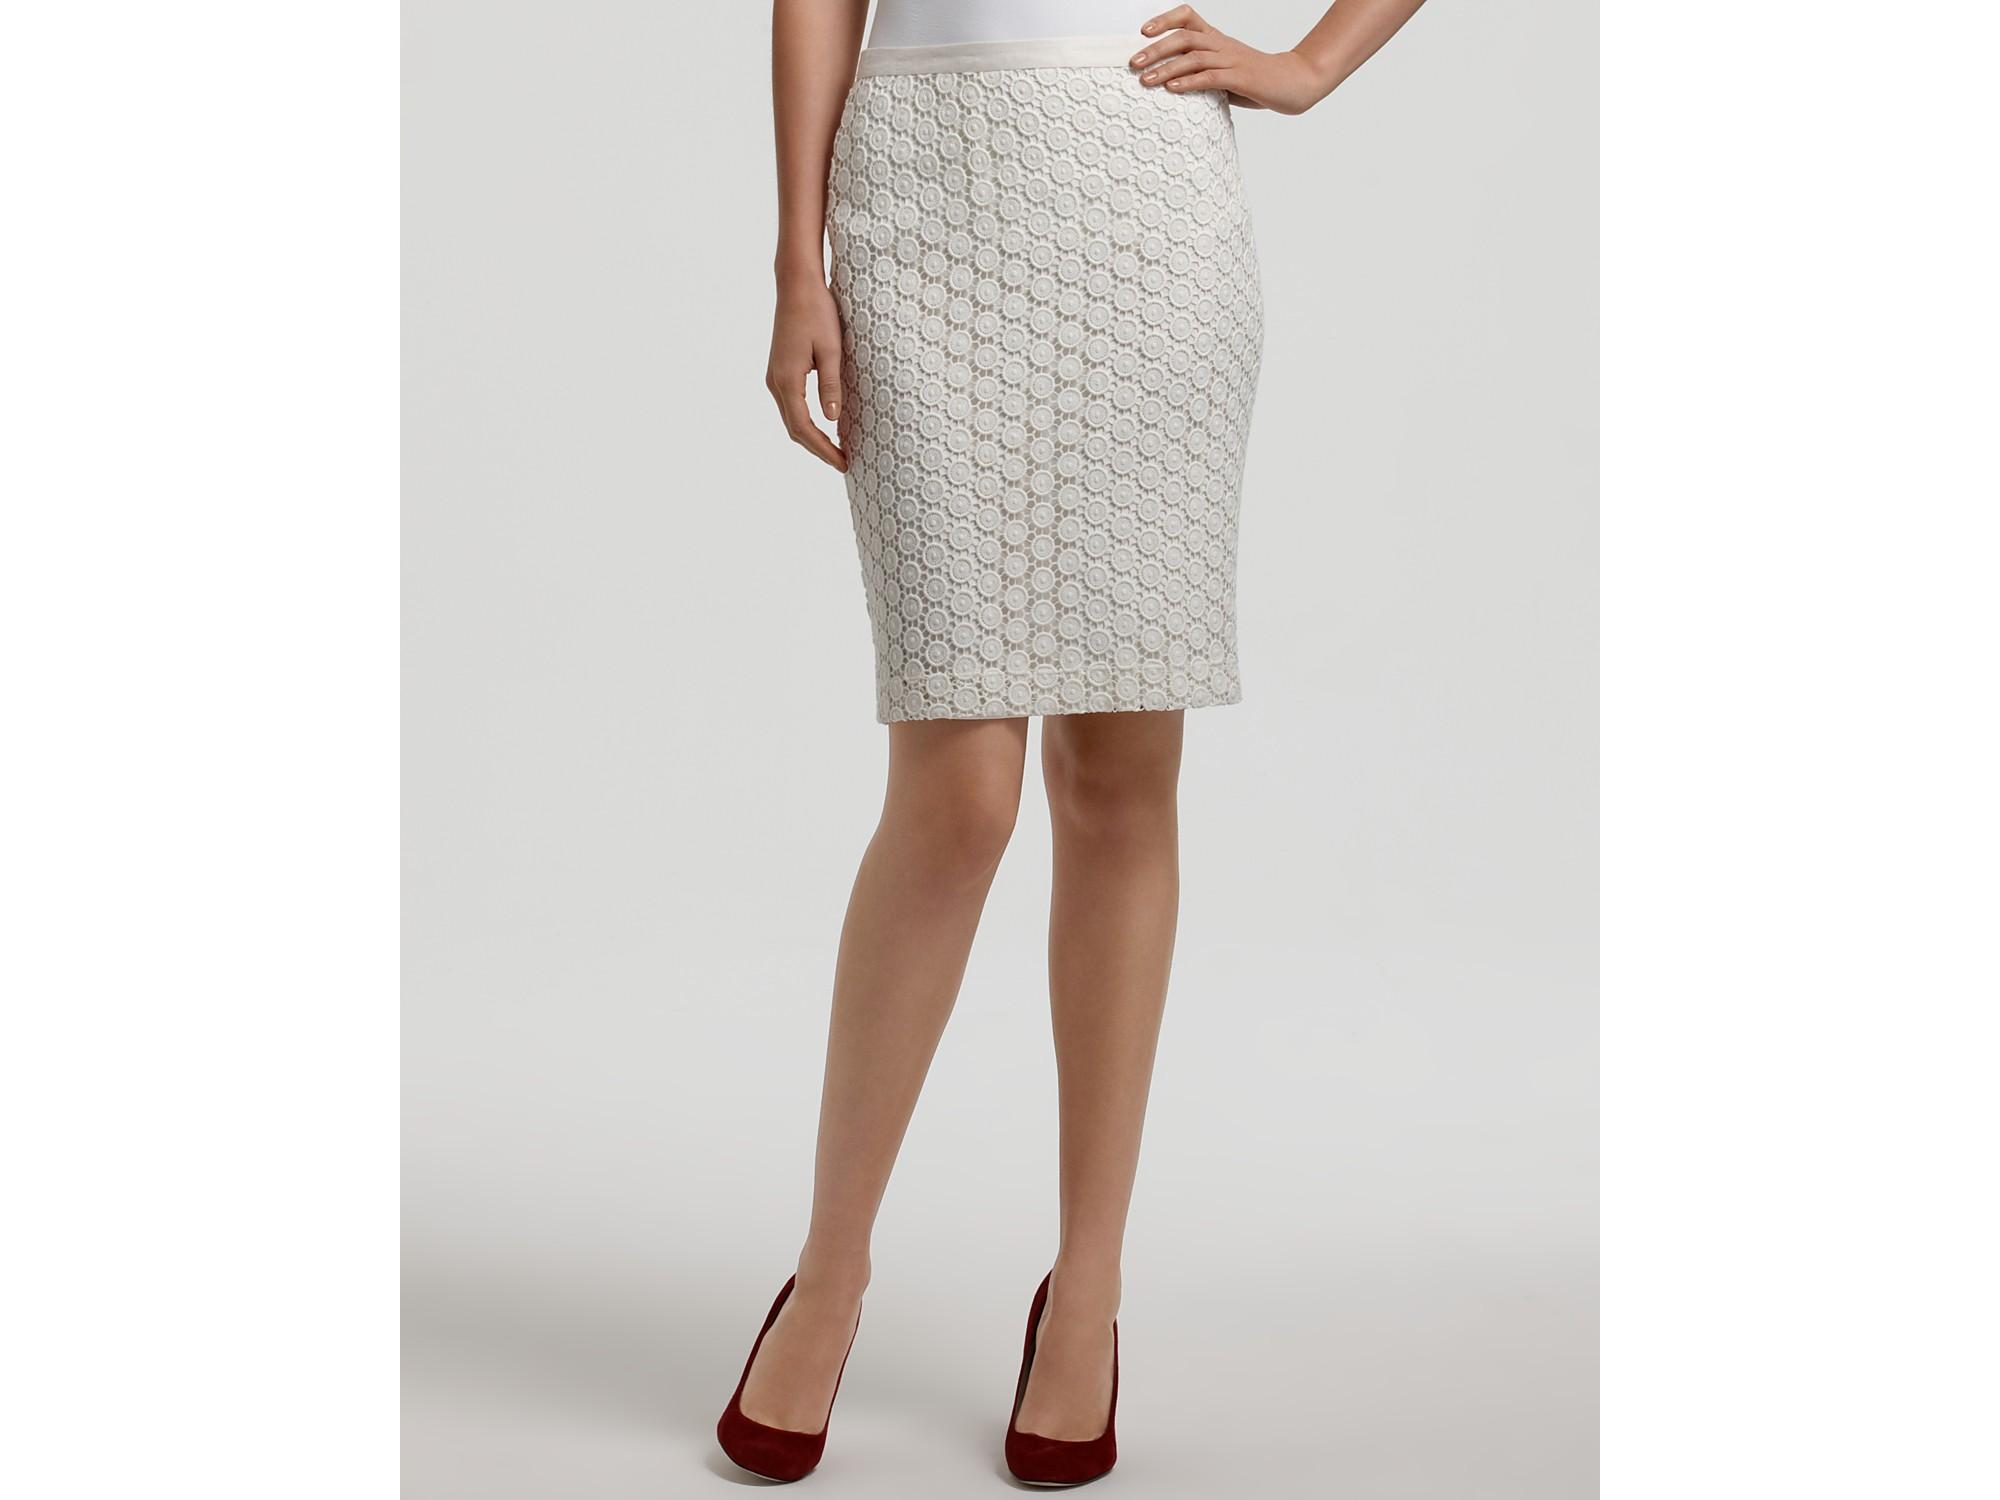 cc8be089cd363 Lyst - Karen Kane Lace Pencil Skirt in White